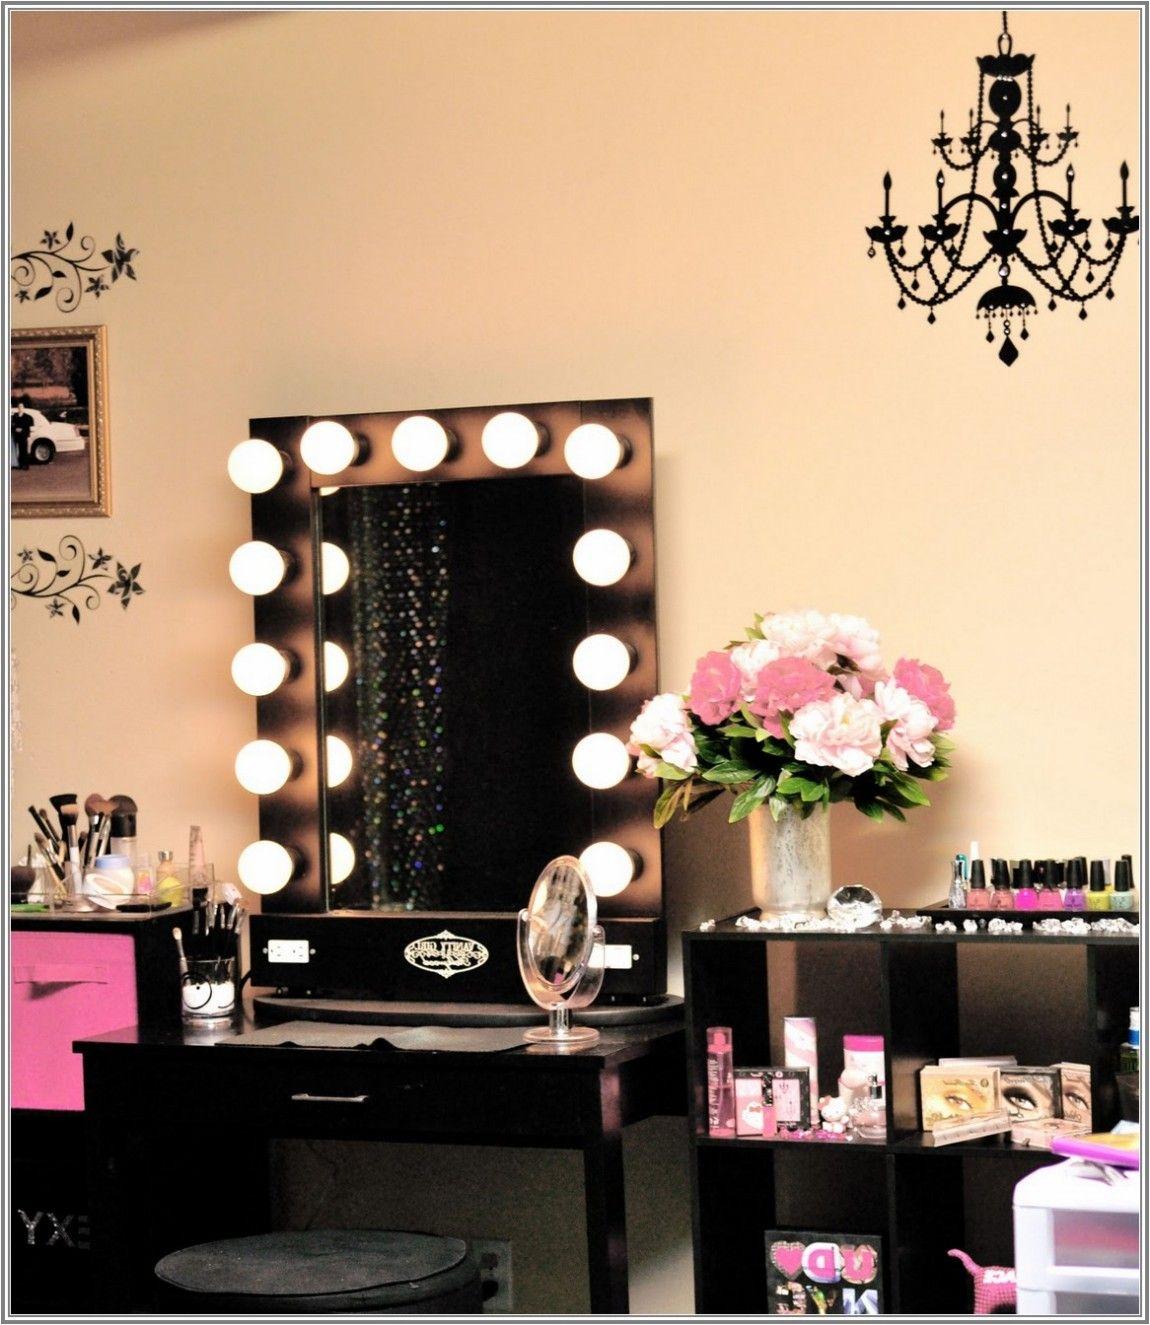 Makeup Table Ideas Makeup Vanity Ideas  Cool Diy Makeup Vanity - Makeup vanity ideas